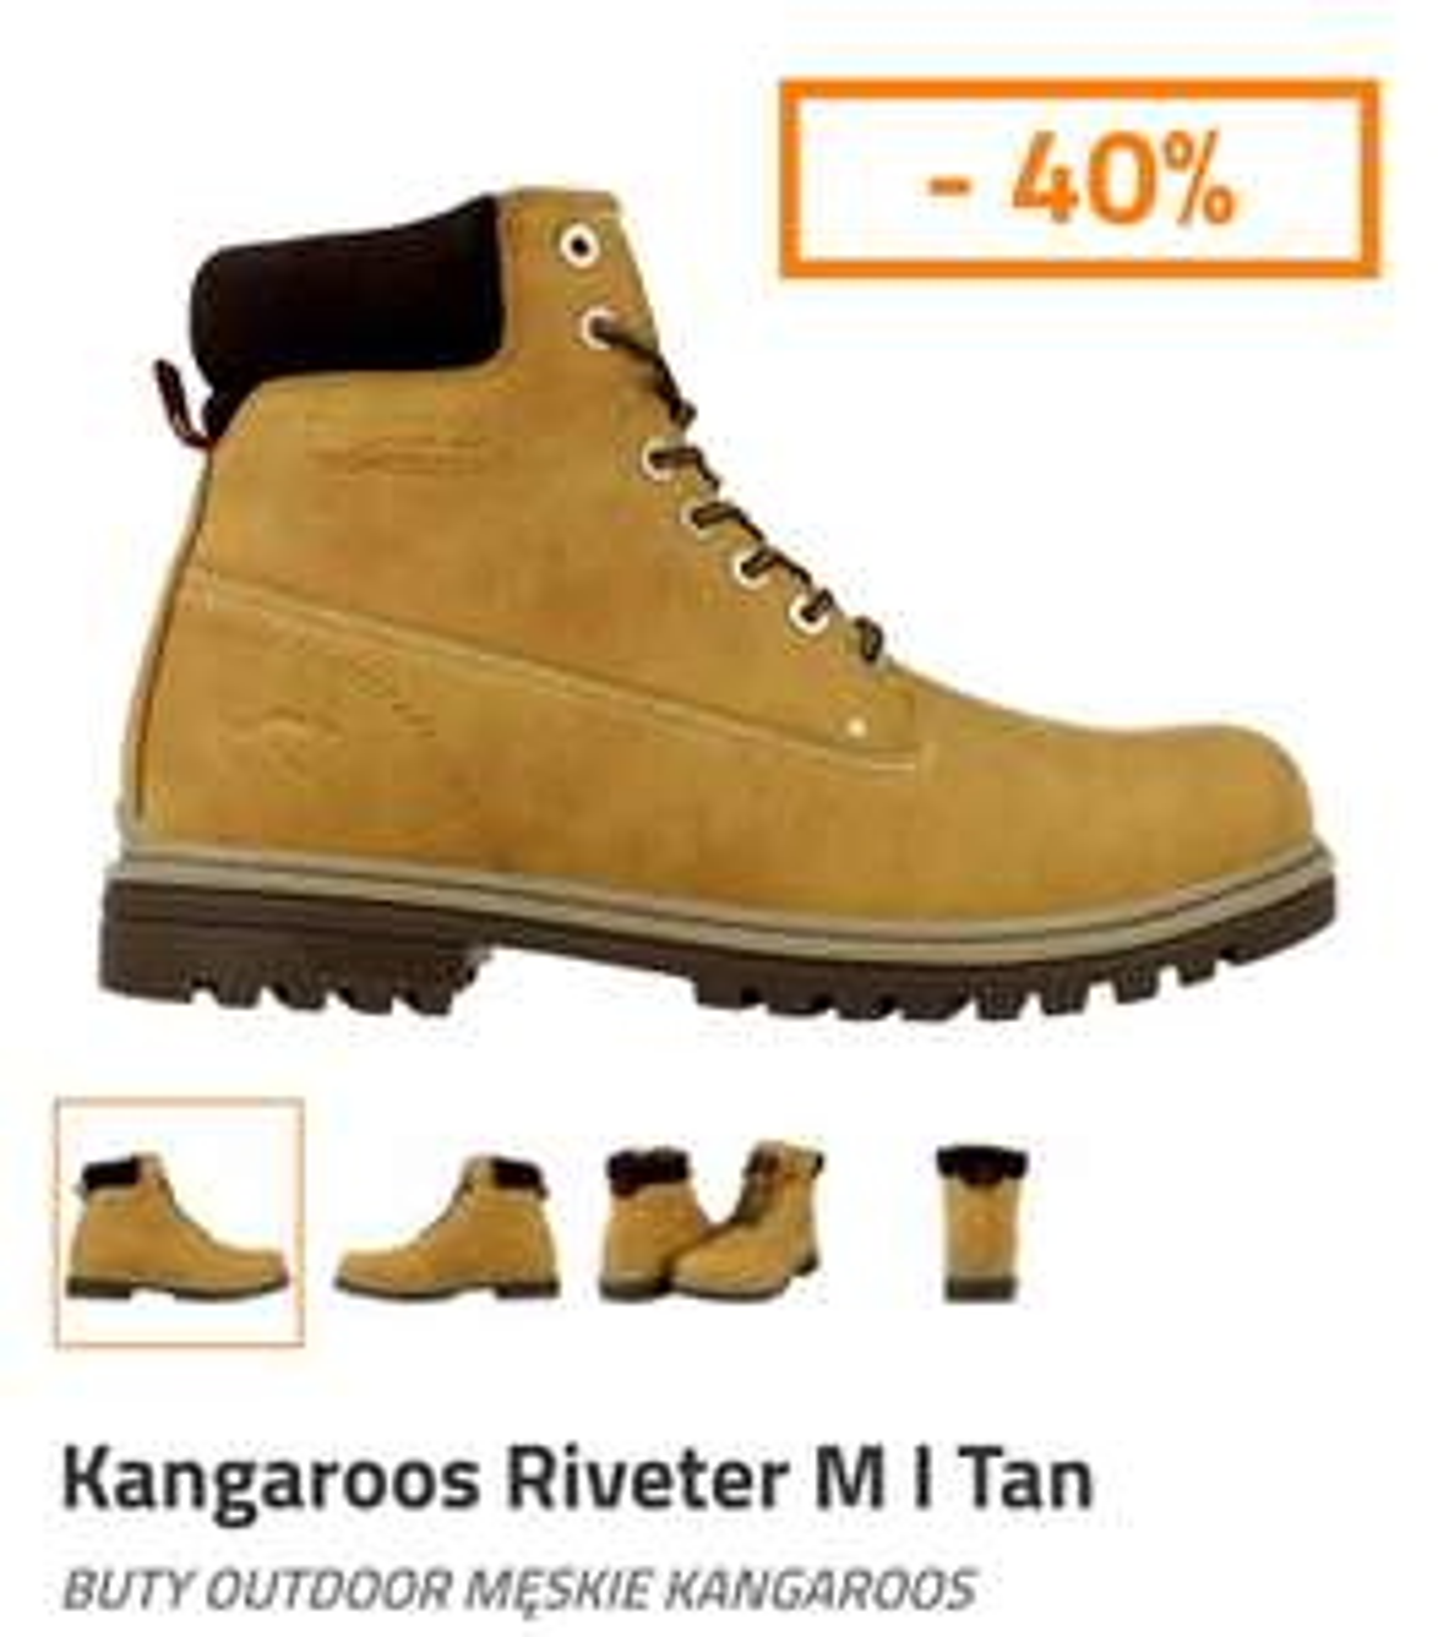 Kangaroos Riveter M I Tan